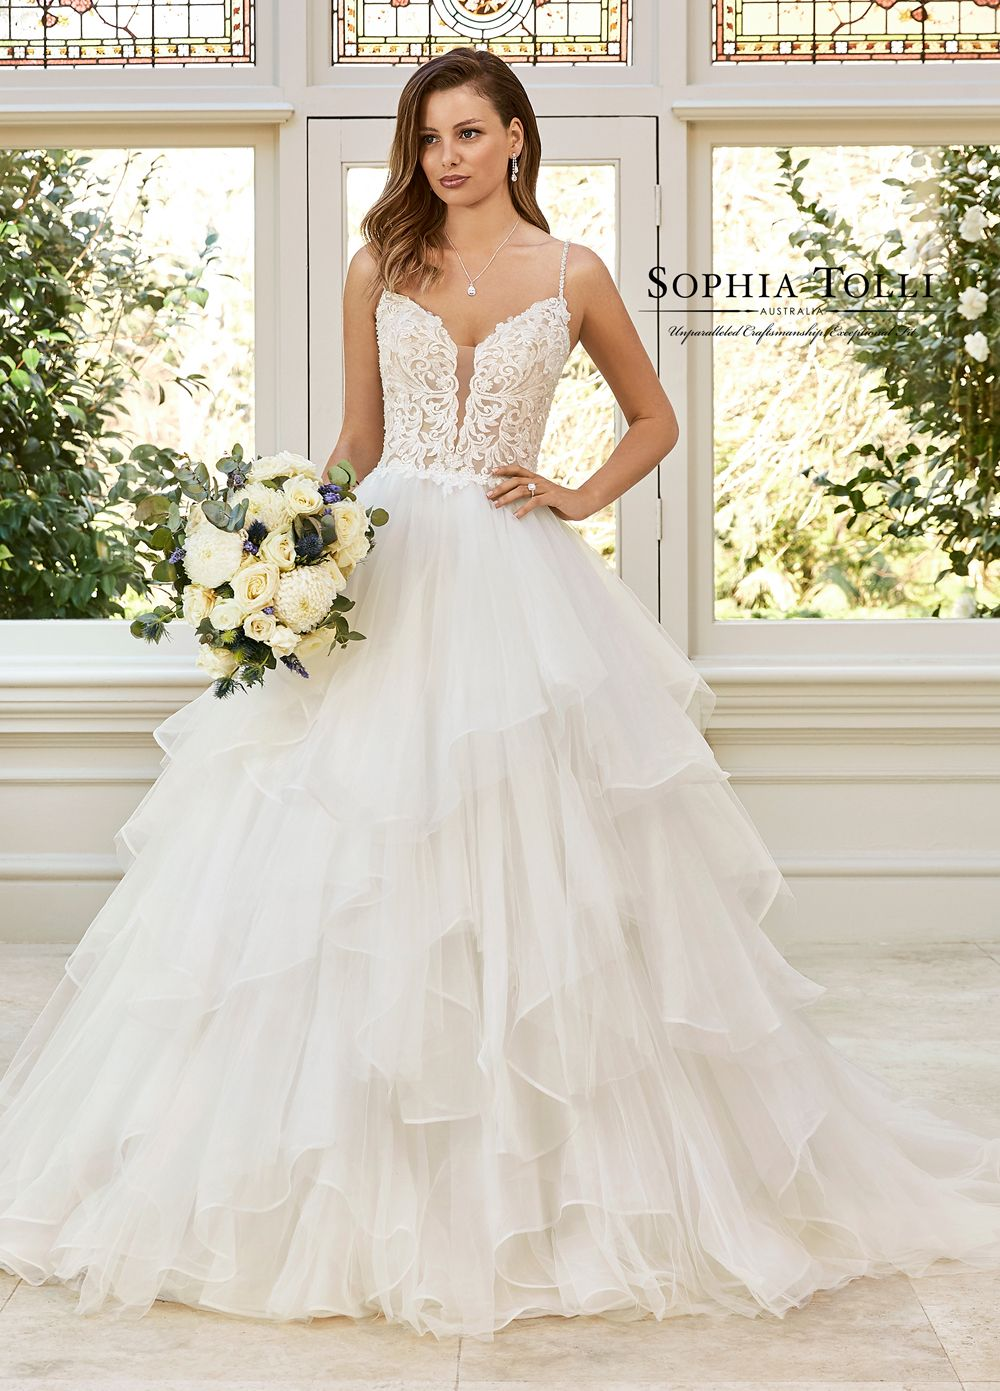 Sophia Tolli Y11952 Remi Layered Skirt Wedding Dress In 2020 Ball Gowns Wedding Ball Gown Wedding Dress Wedding Dress Prices